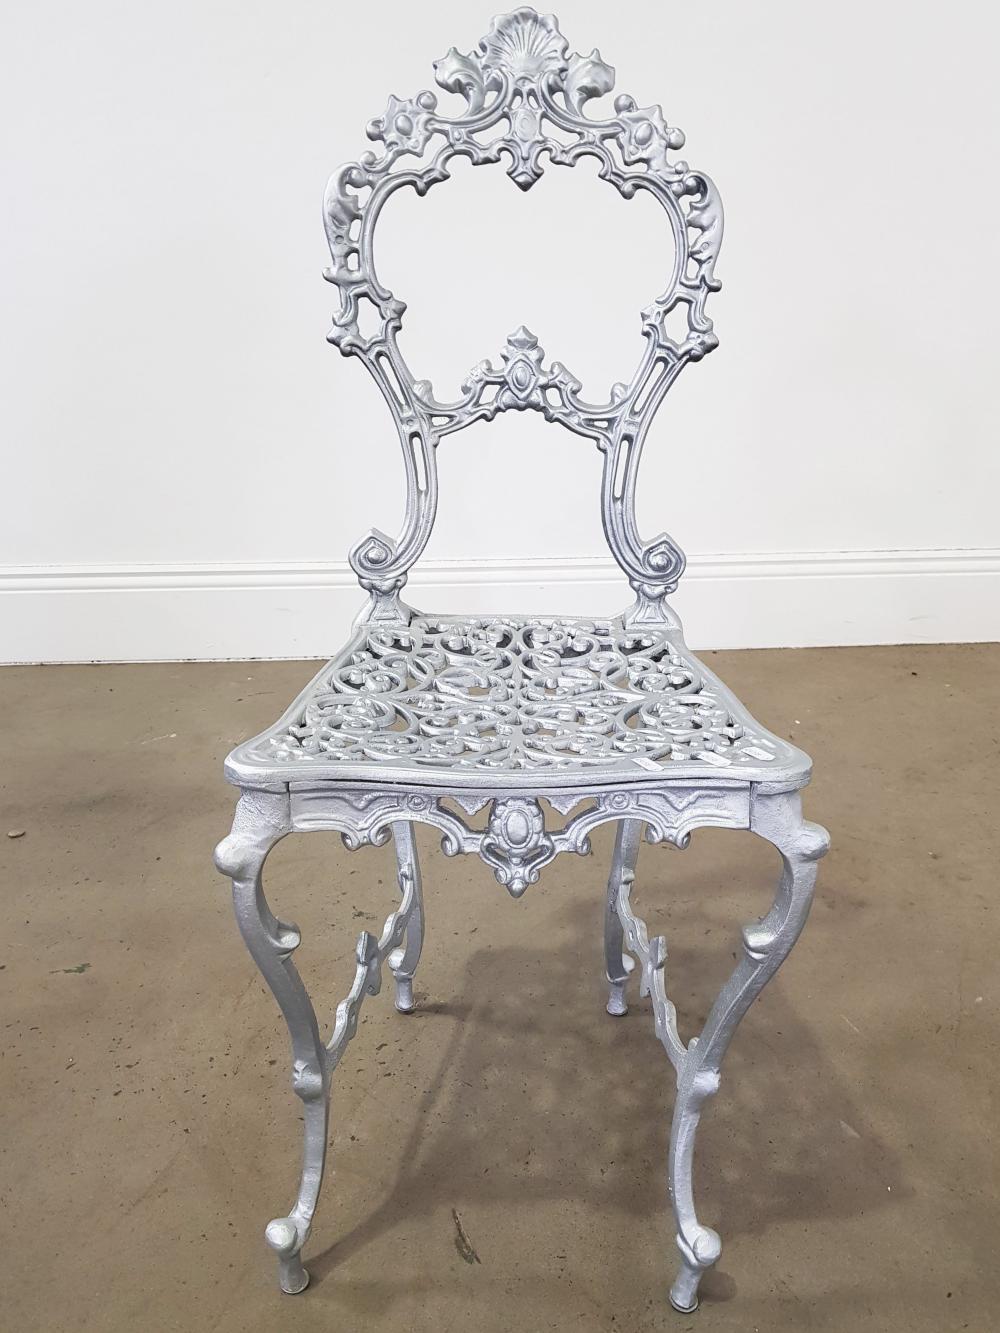 Ornate painted metal frame chair (h93cm)